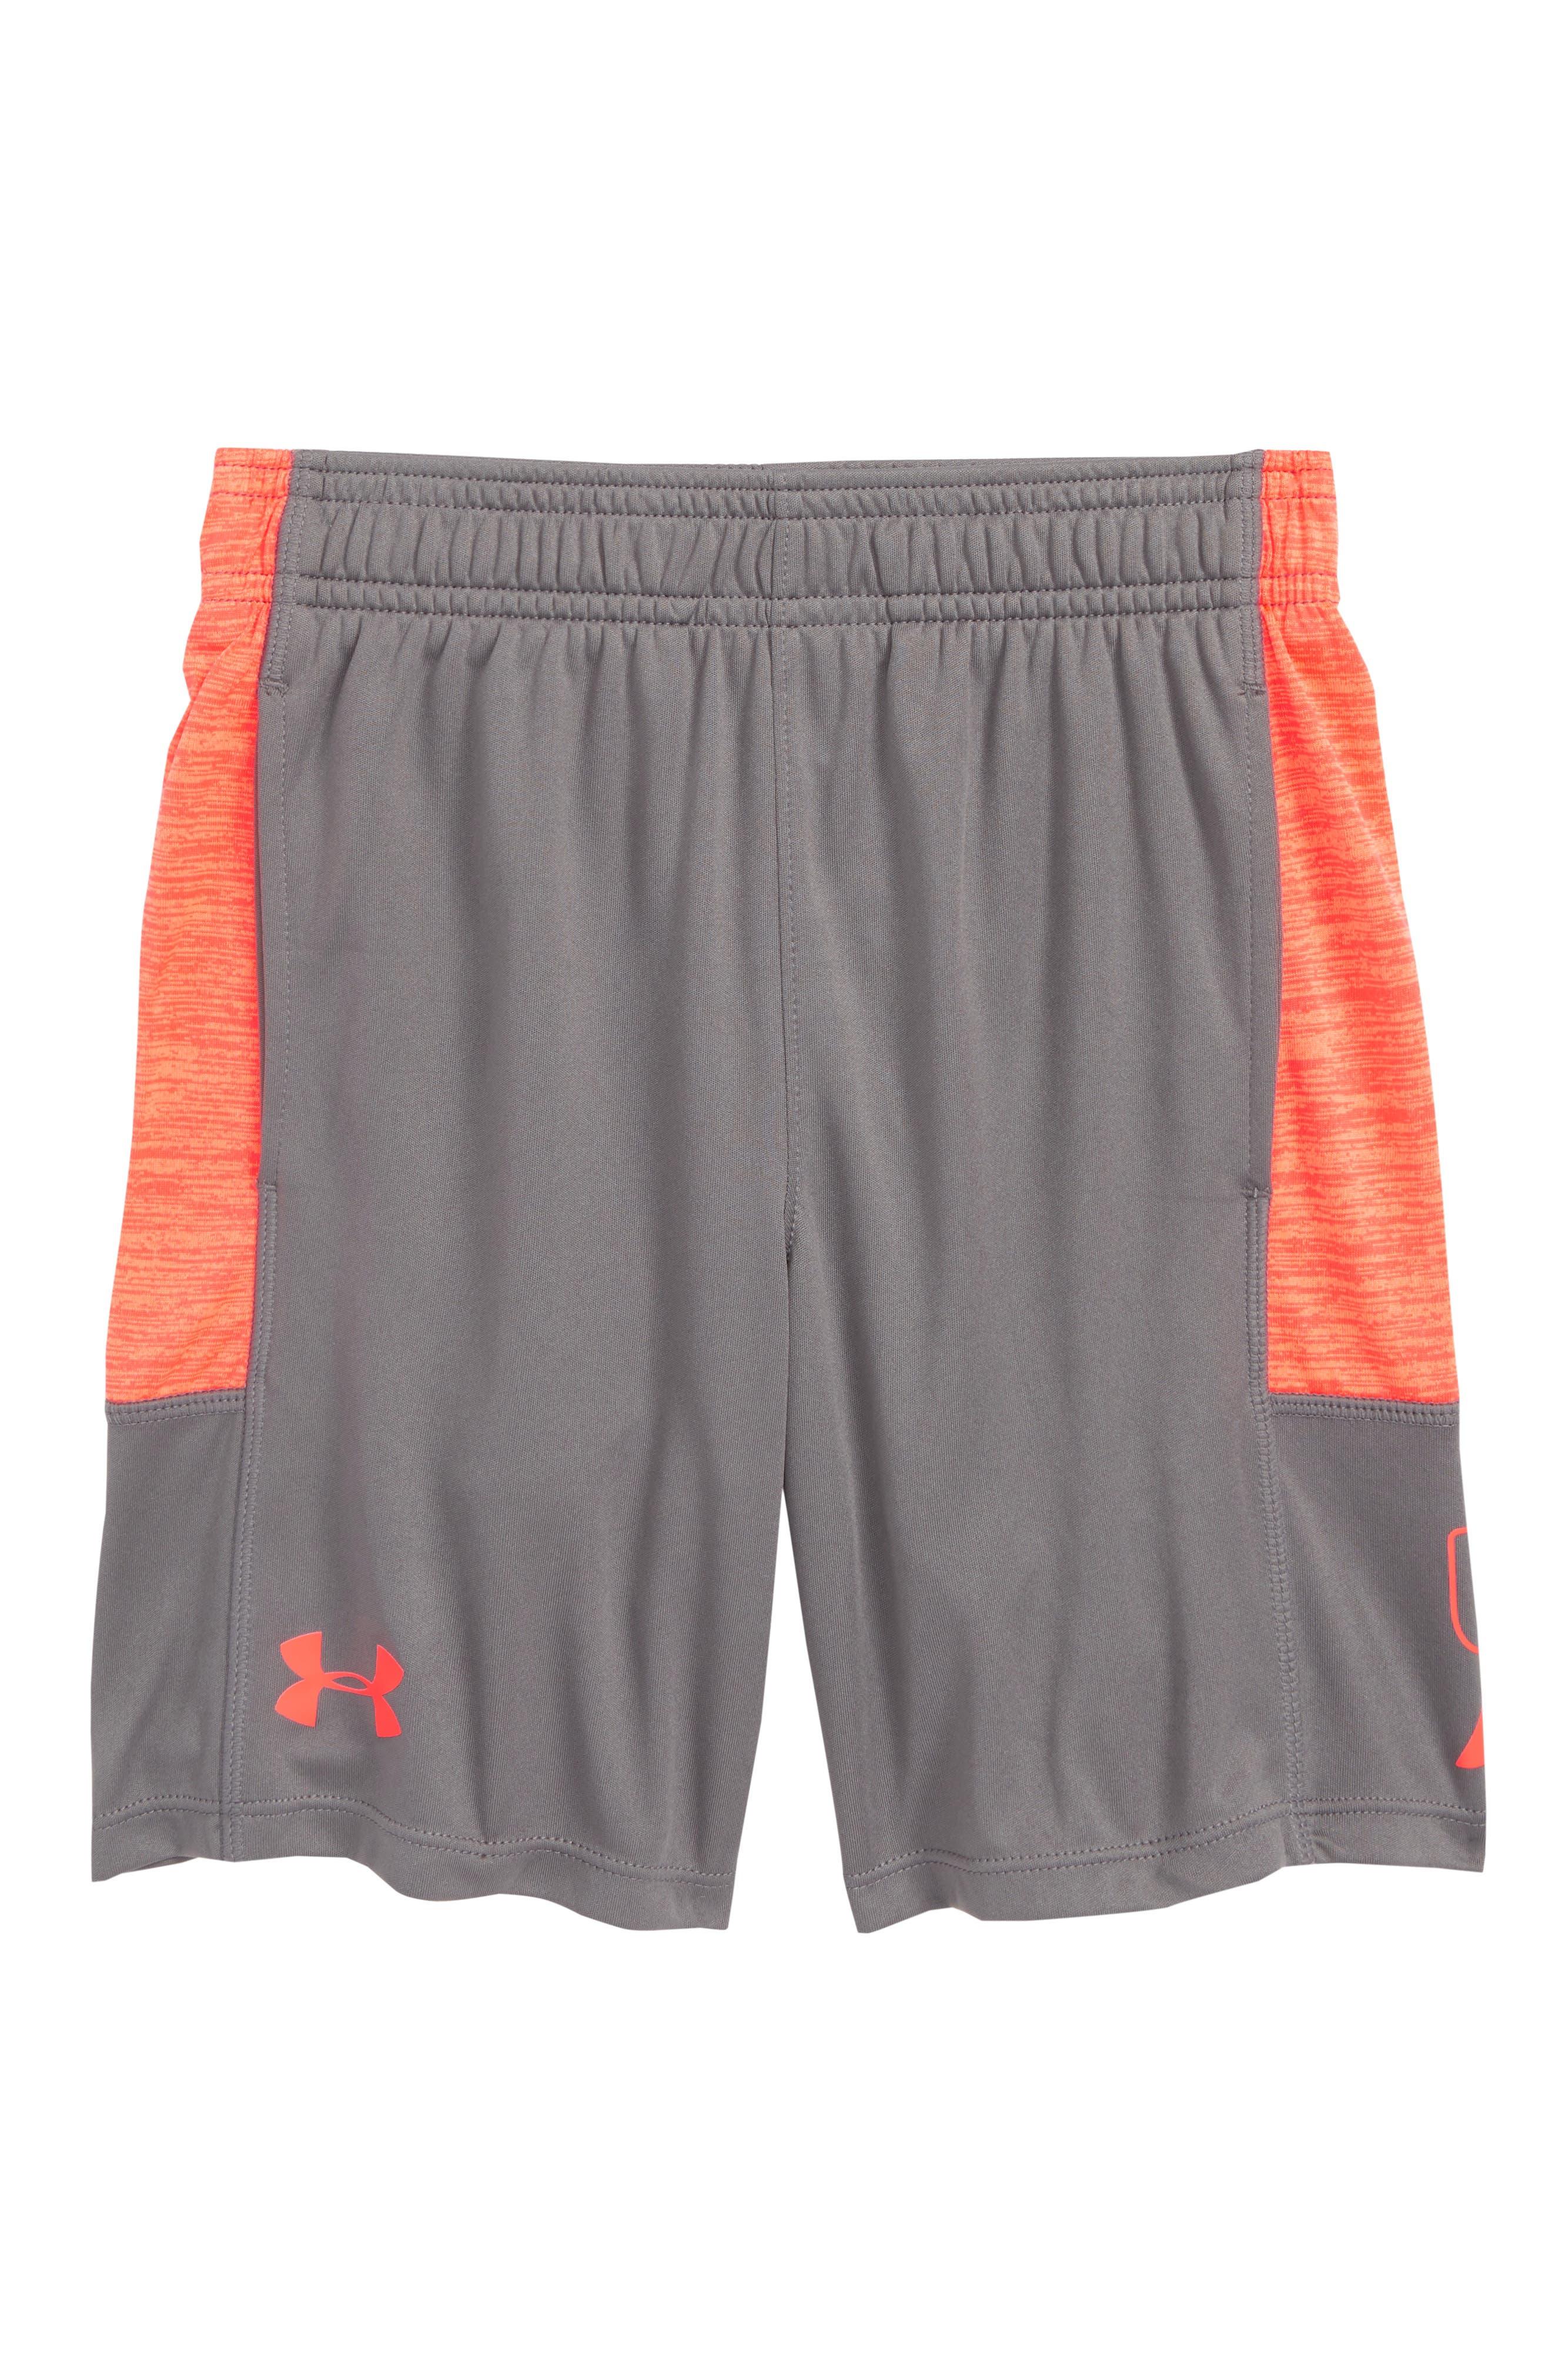 Twist Stunt HeatGear<sup>®</sup> Shorts,                             Main thumbnail 1, color,                             Graphite/ Neon Coral